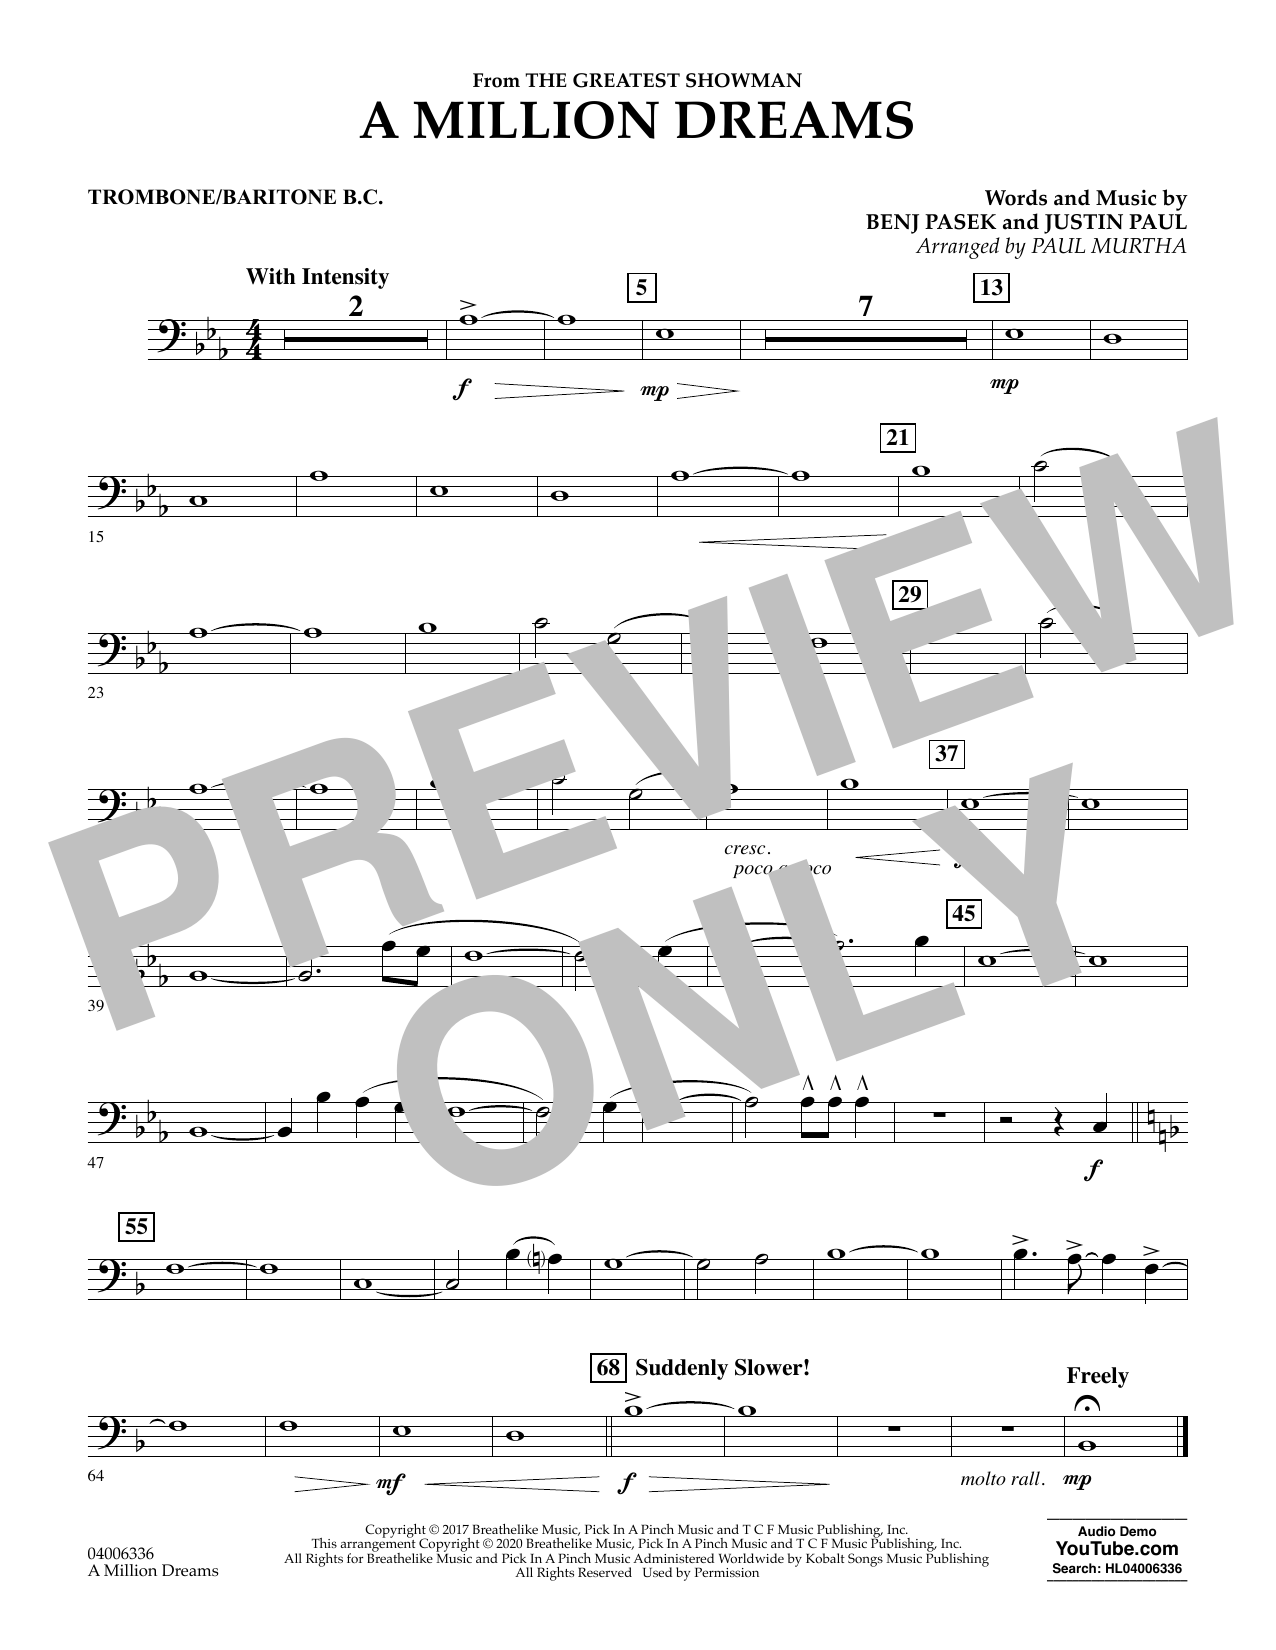 A Million Dreams (from The Greatest Showman) (arr. Paul Murtha) - Trombone/Baritone B.C. (Concert Band)